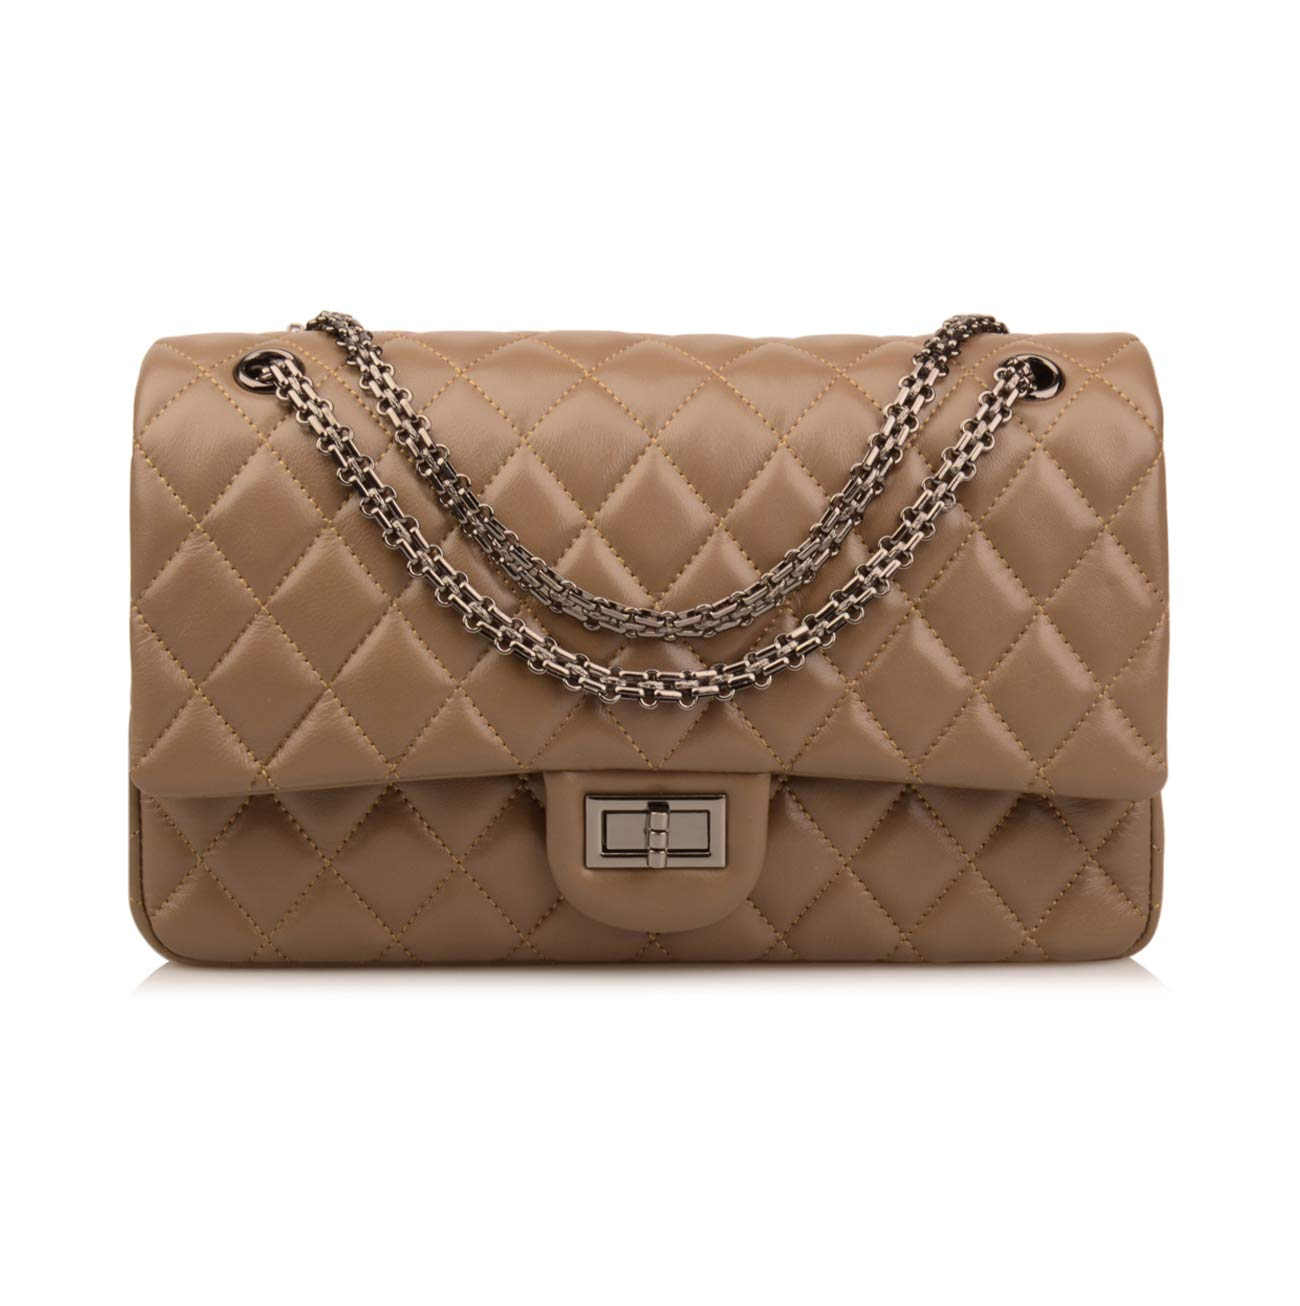 Ainifeel Women's Genuine Leather Quilted Shoulder Handbag Hobo Bag Crossbody Purse (Medium, Khaki)